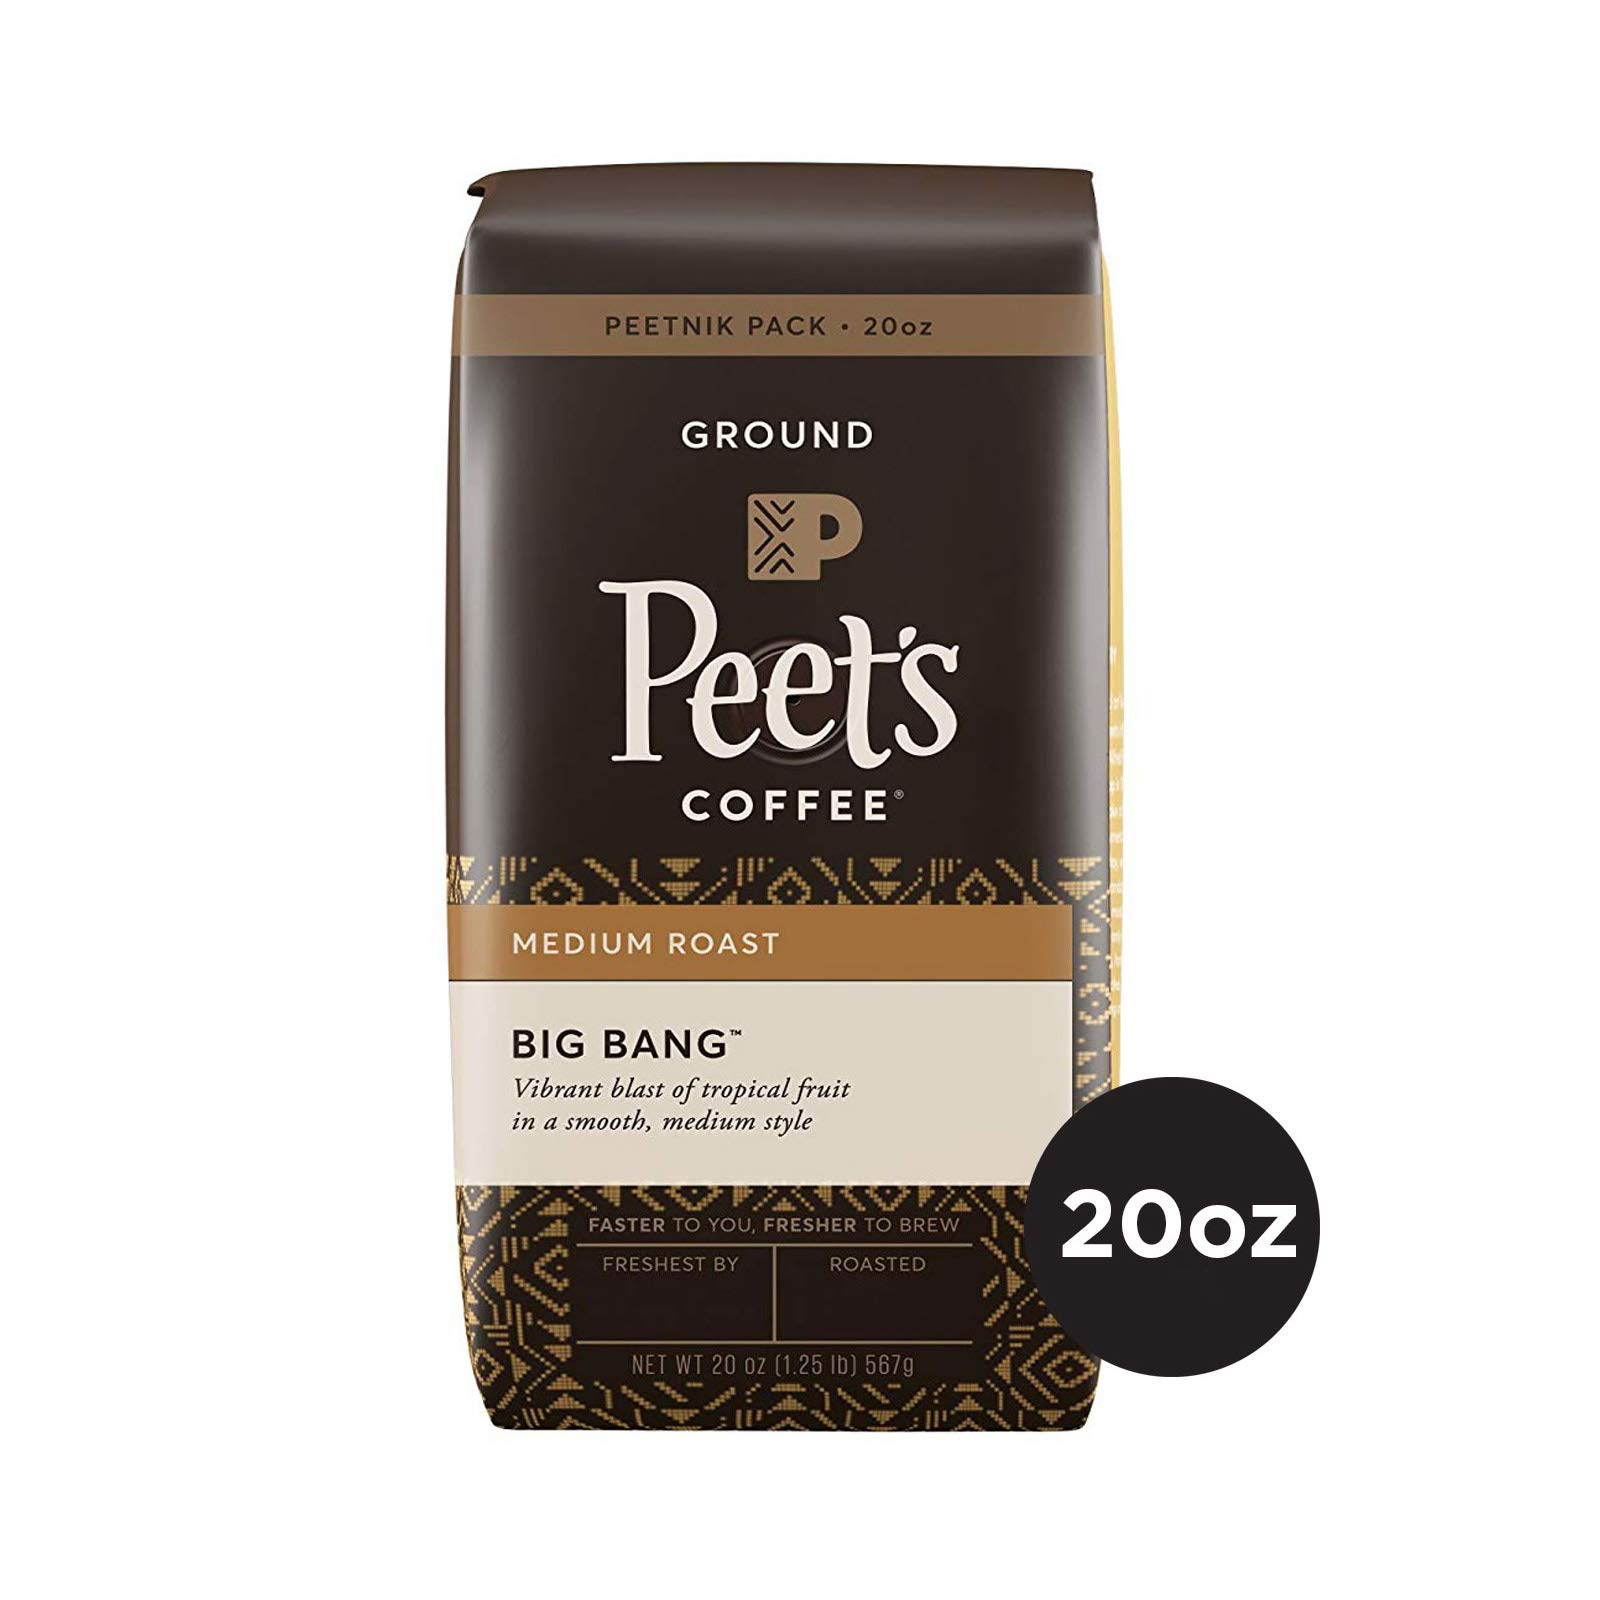 Peet's Coffee Big Bang, Medium Roast Ground Coffee, 20 Ounce Peetnik Pack, Direct Trade Coffee